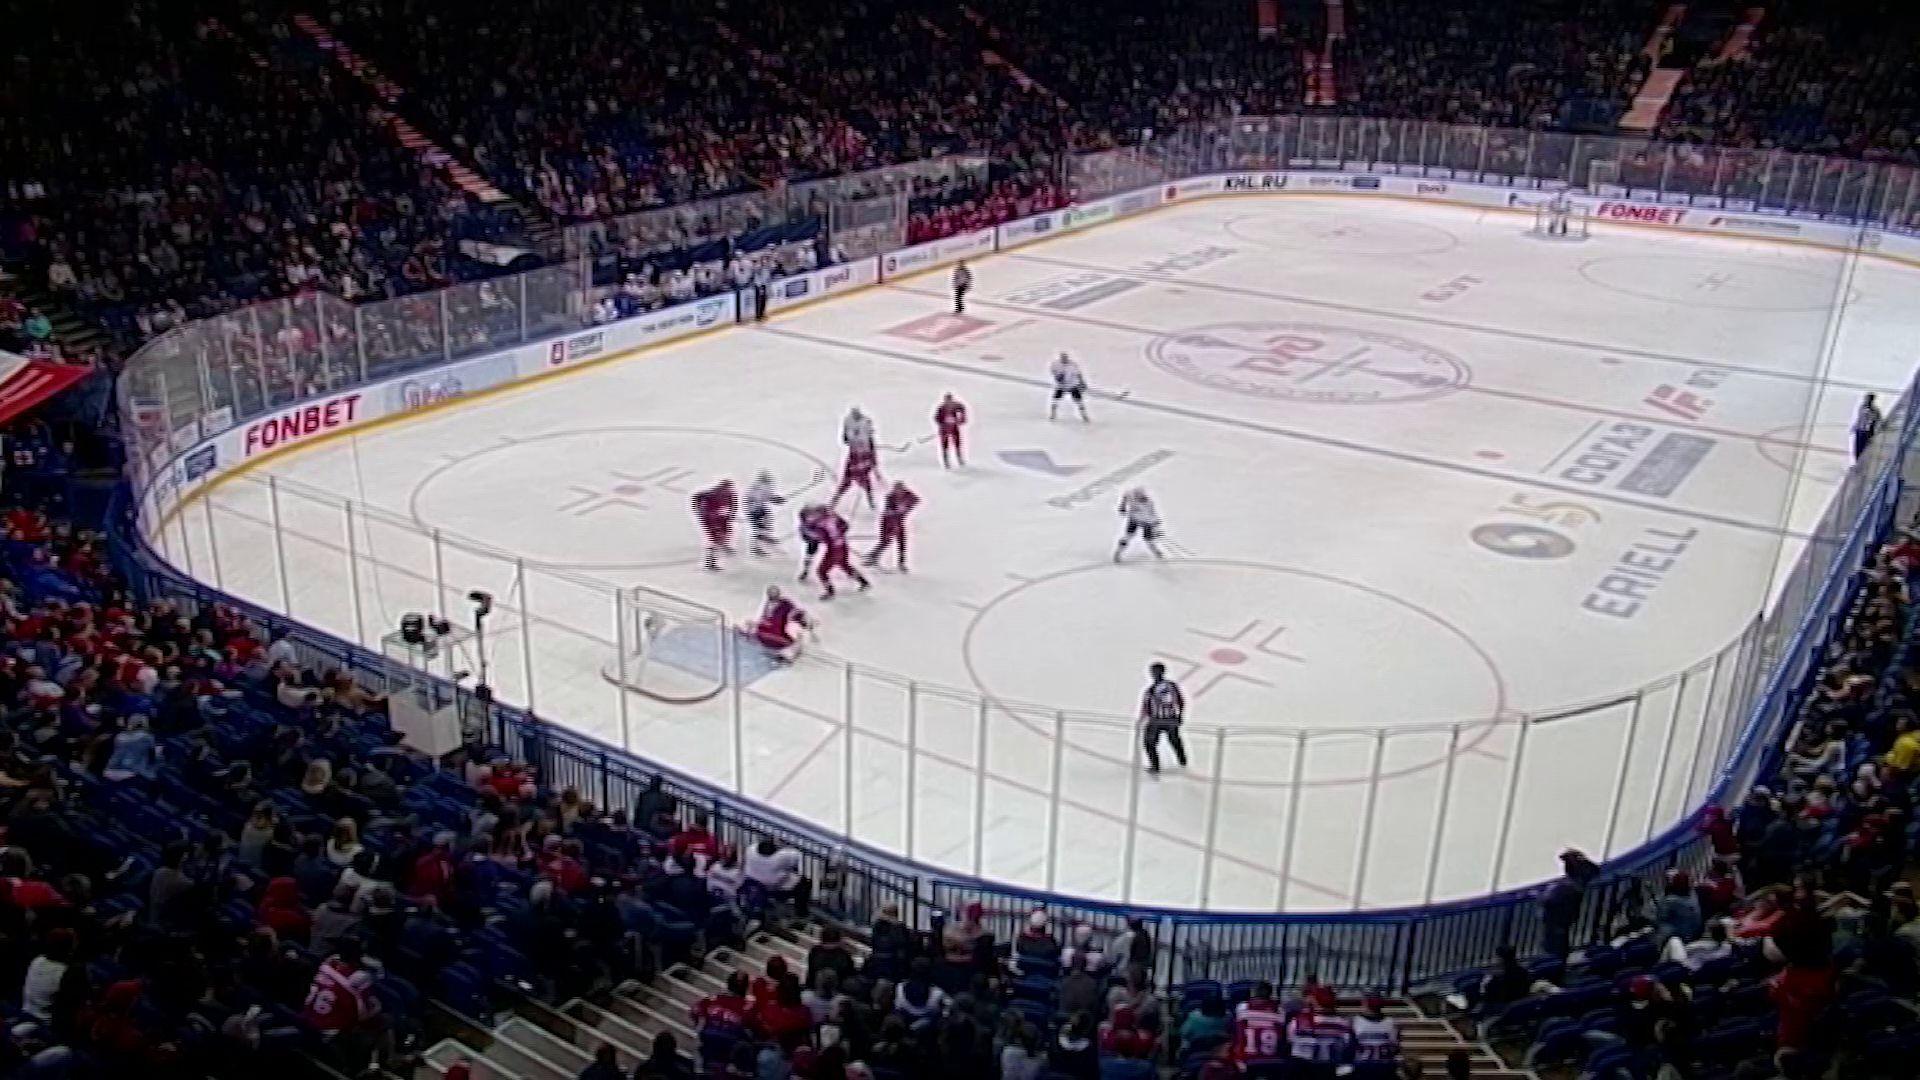 Капитан нижегородского «Торпедо» может перейти в «Локомотив»